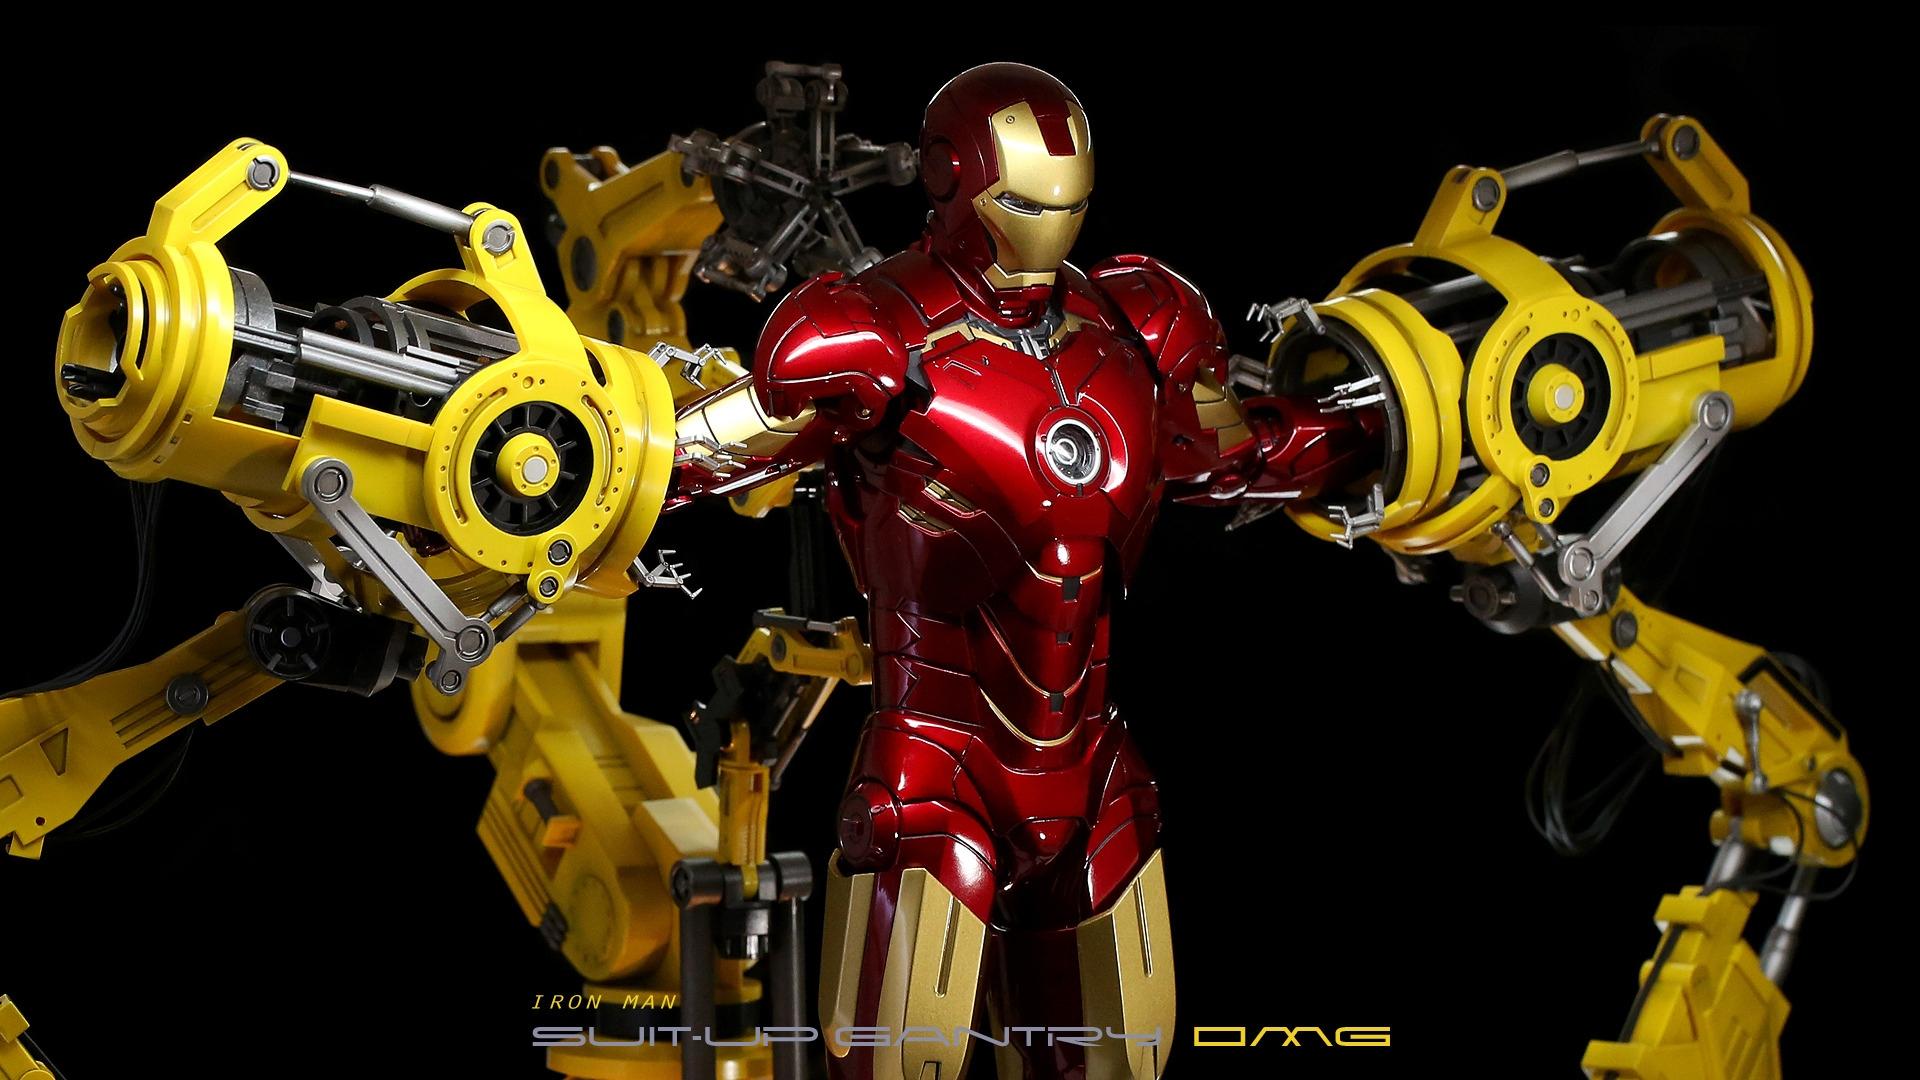 Iron man full hd wallpaper and background image 1920x1080 id318715 movie iron man wallpaper voltagebd Choice Image